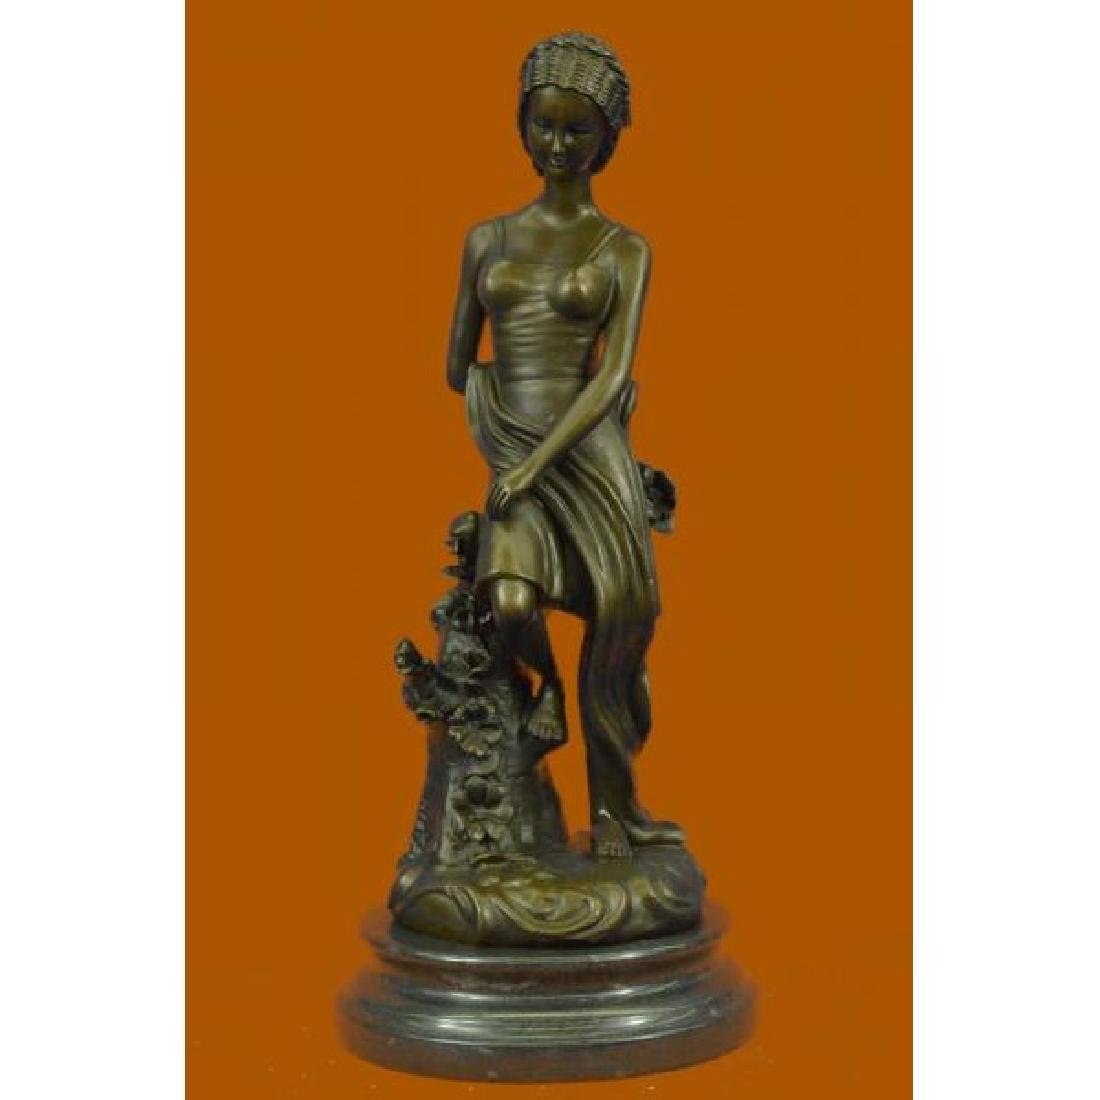 Milo Gorgeous Woman Female Bronze Sculpture Next to